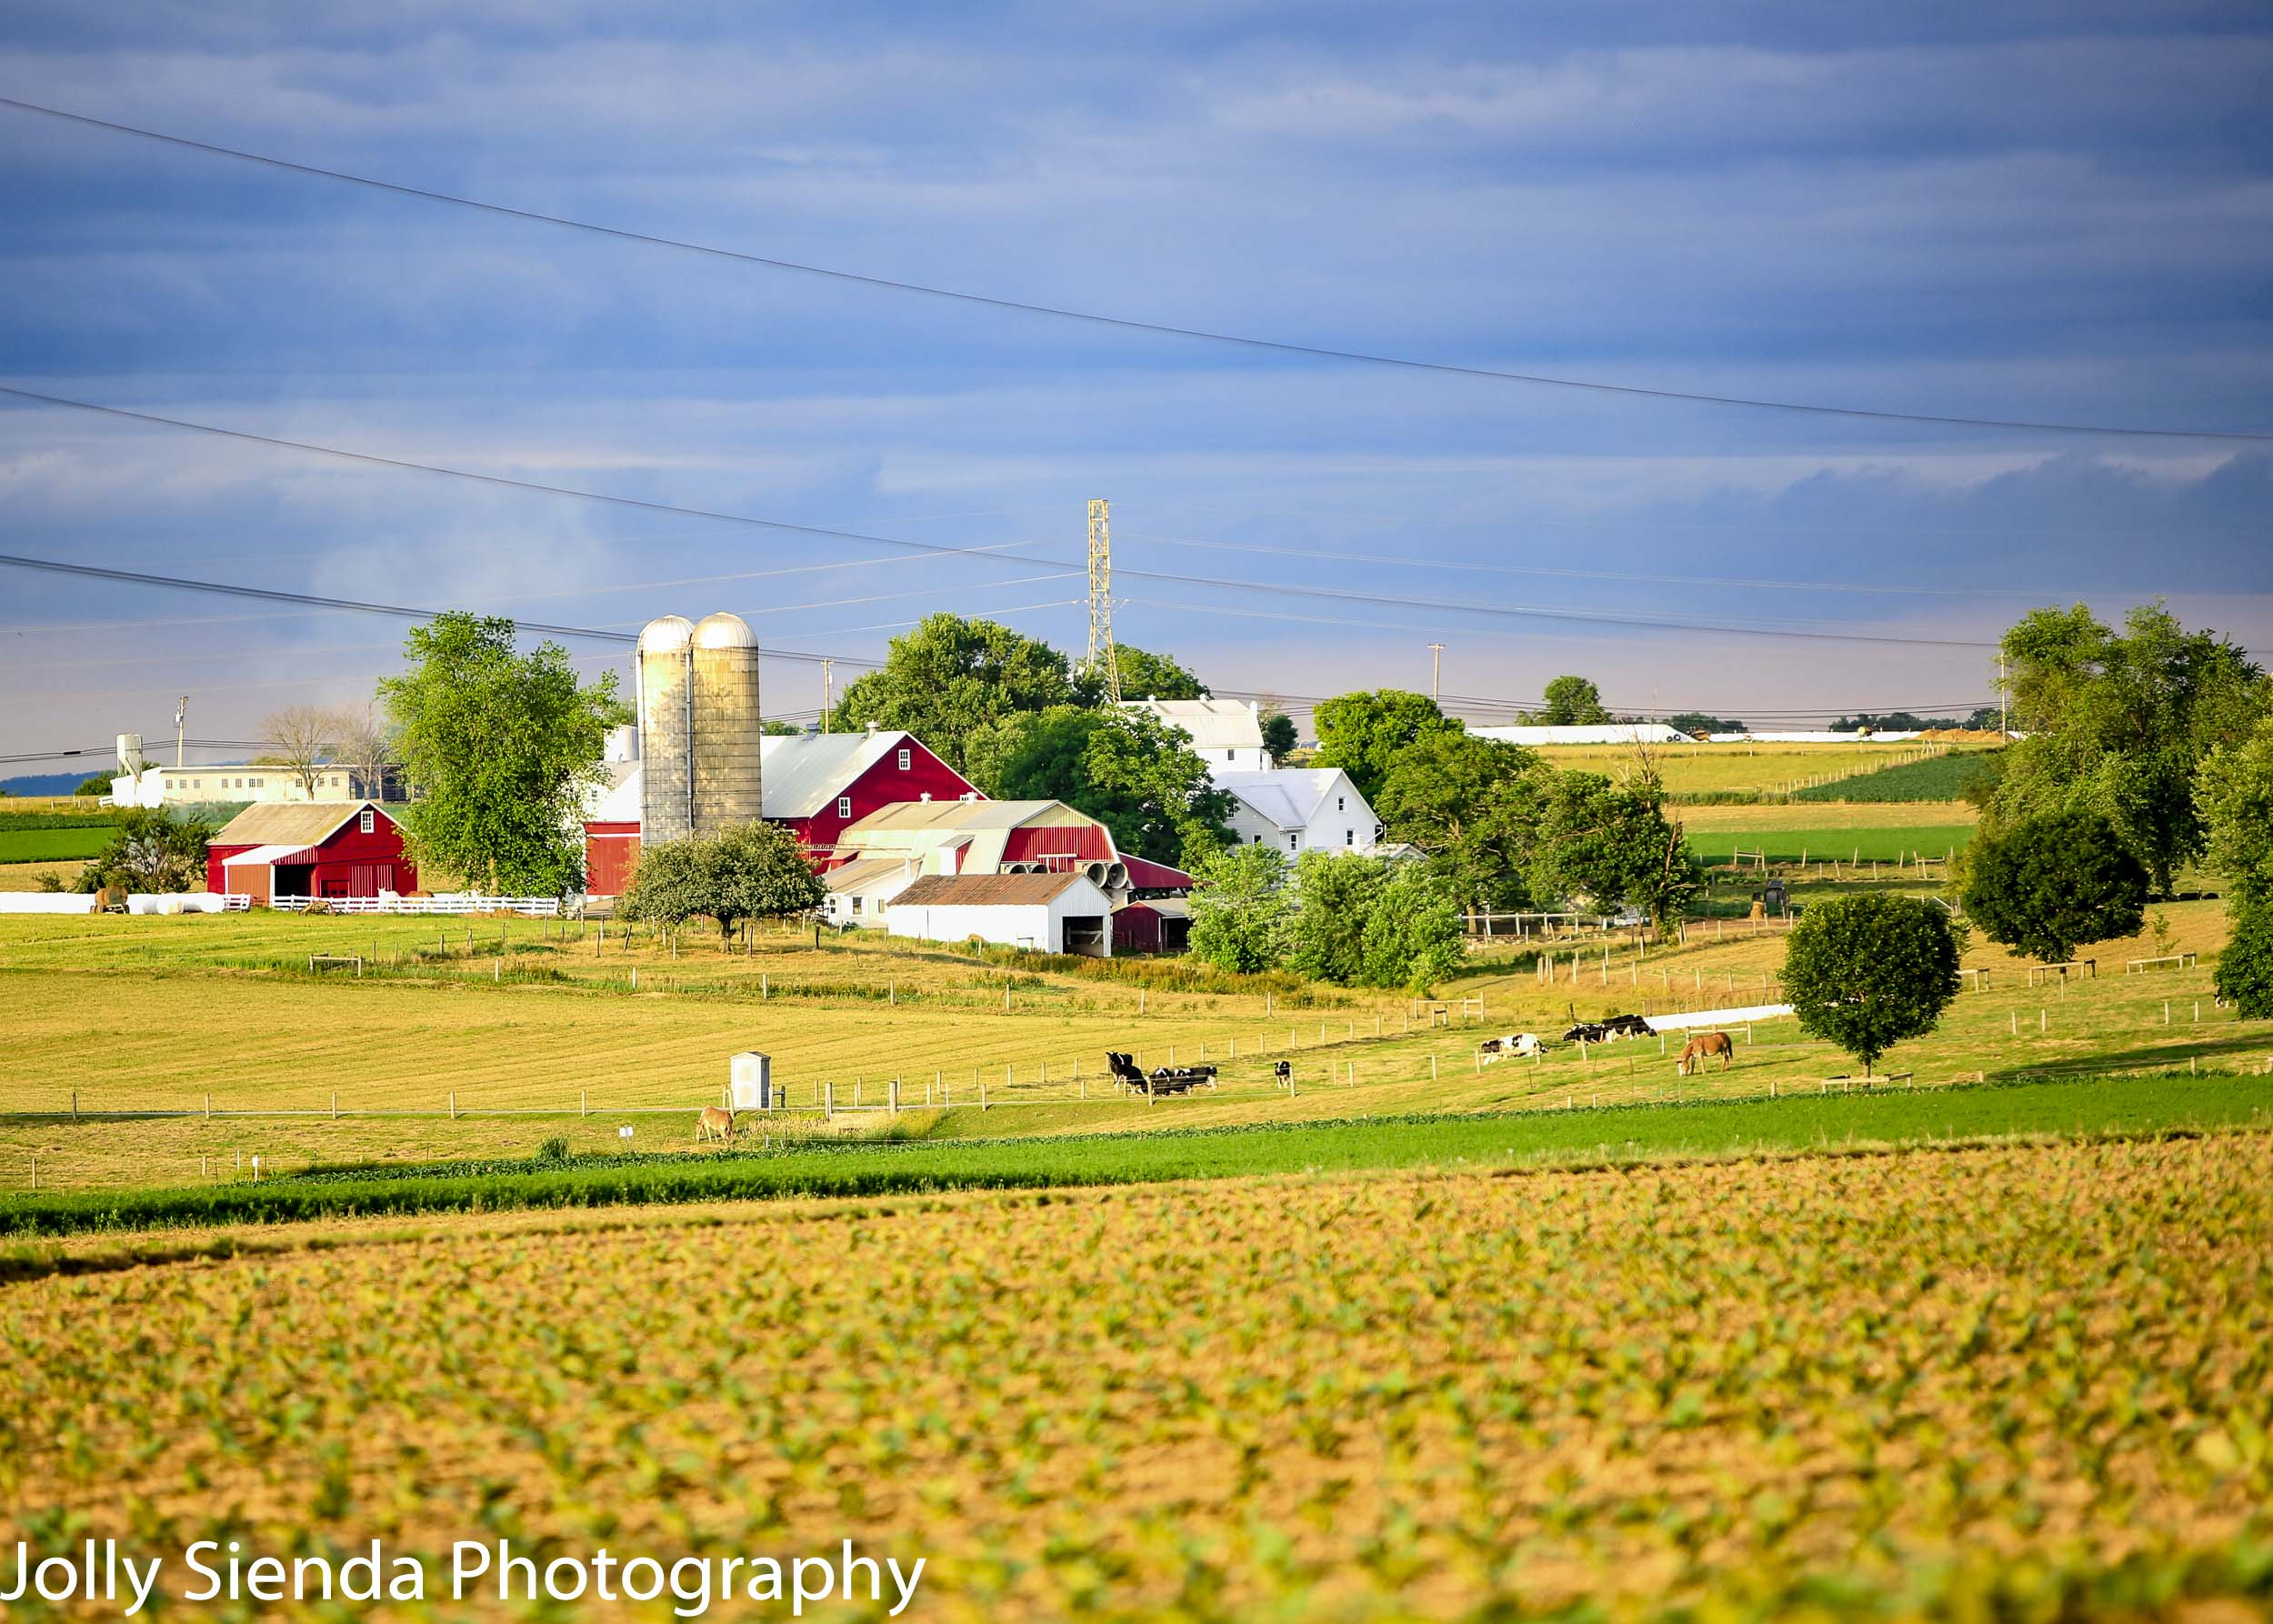 Red Barns, Silos, Cows, and Green Pastures on Amish Farmland